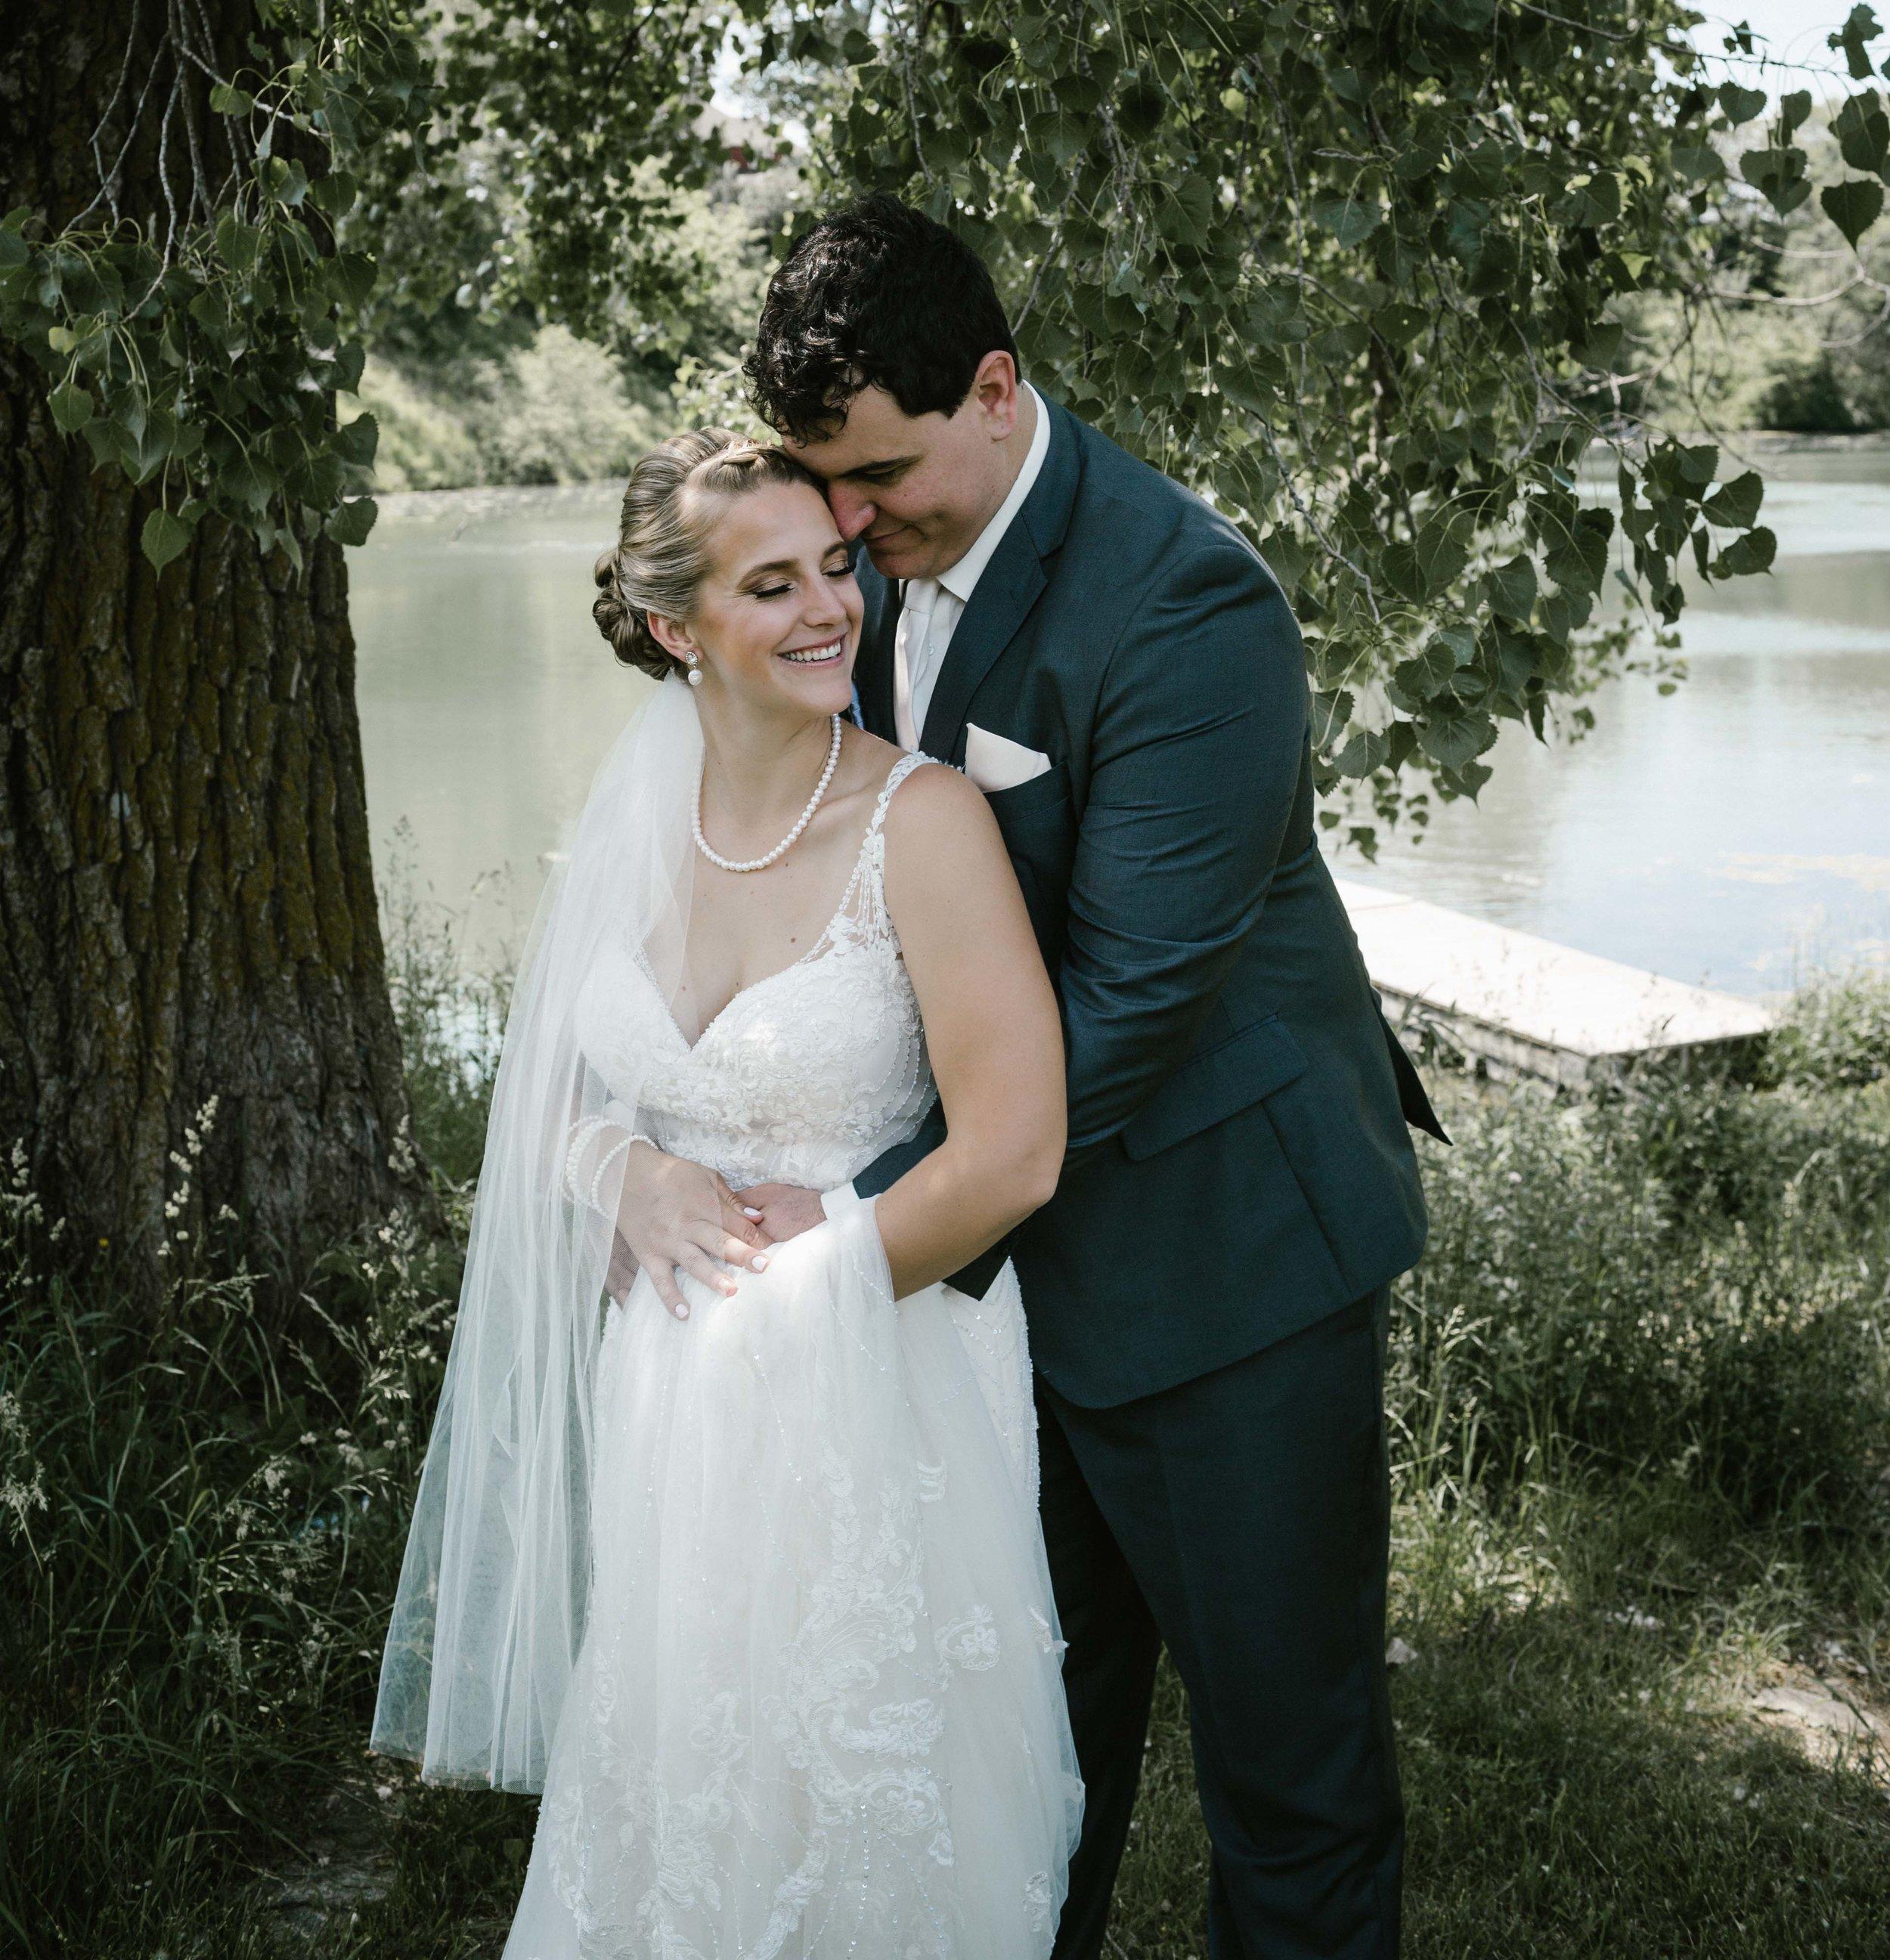 Iowa wedding_Dawn McClannan Photo-23.jpg